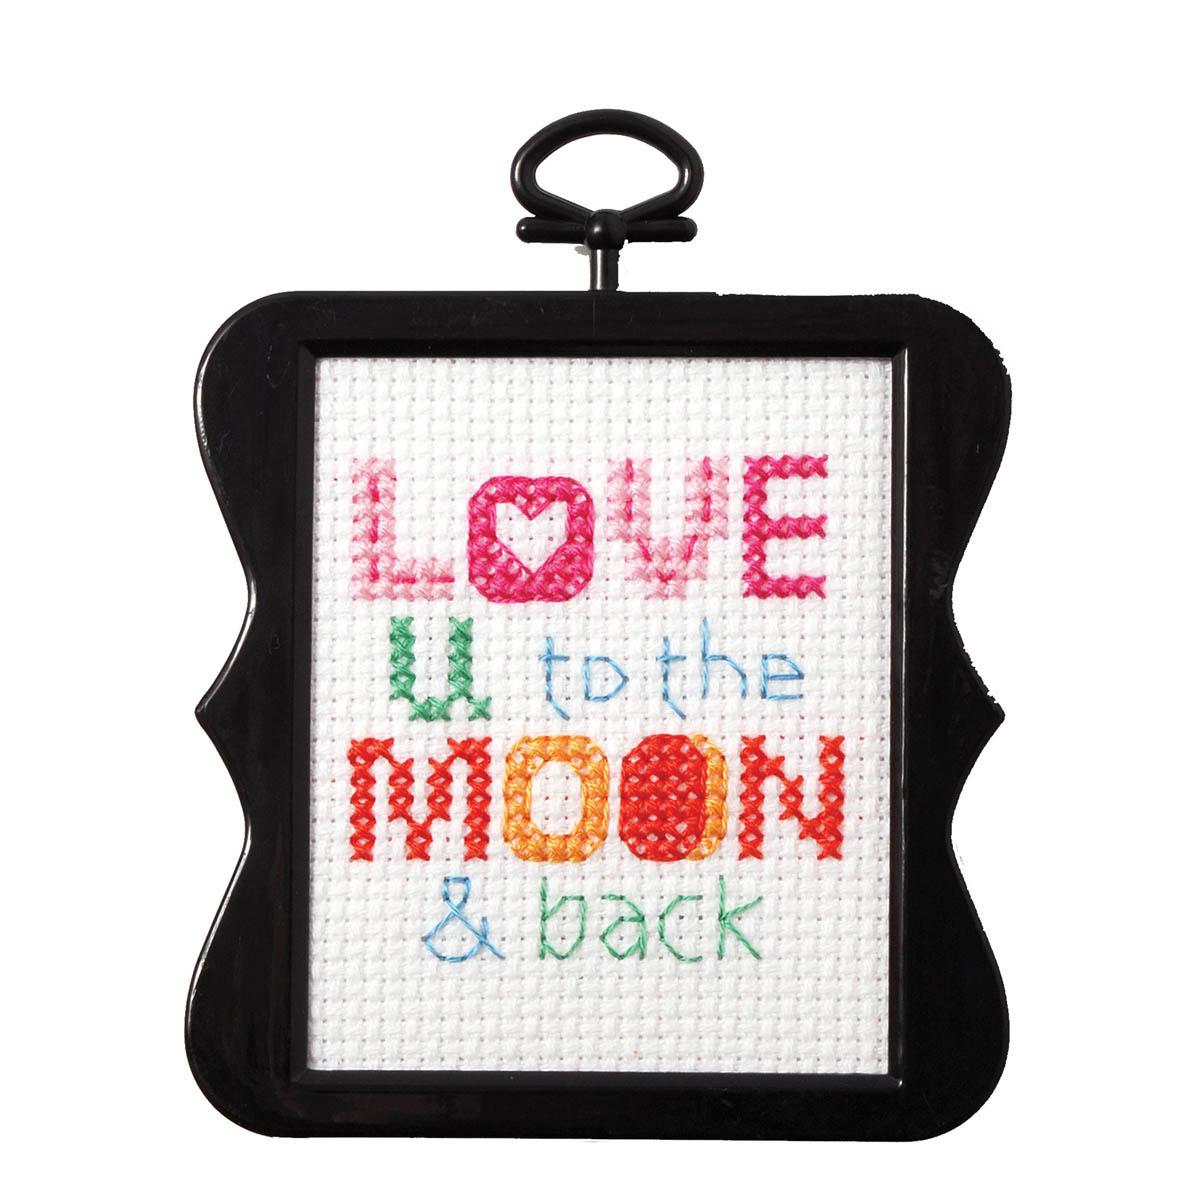 Bucilla ® Counted Cross Stitch - Beginner Stitchery - Mini - Love You to the Moon & Back